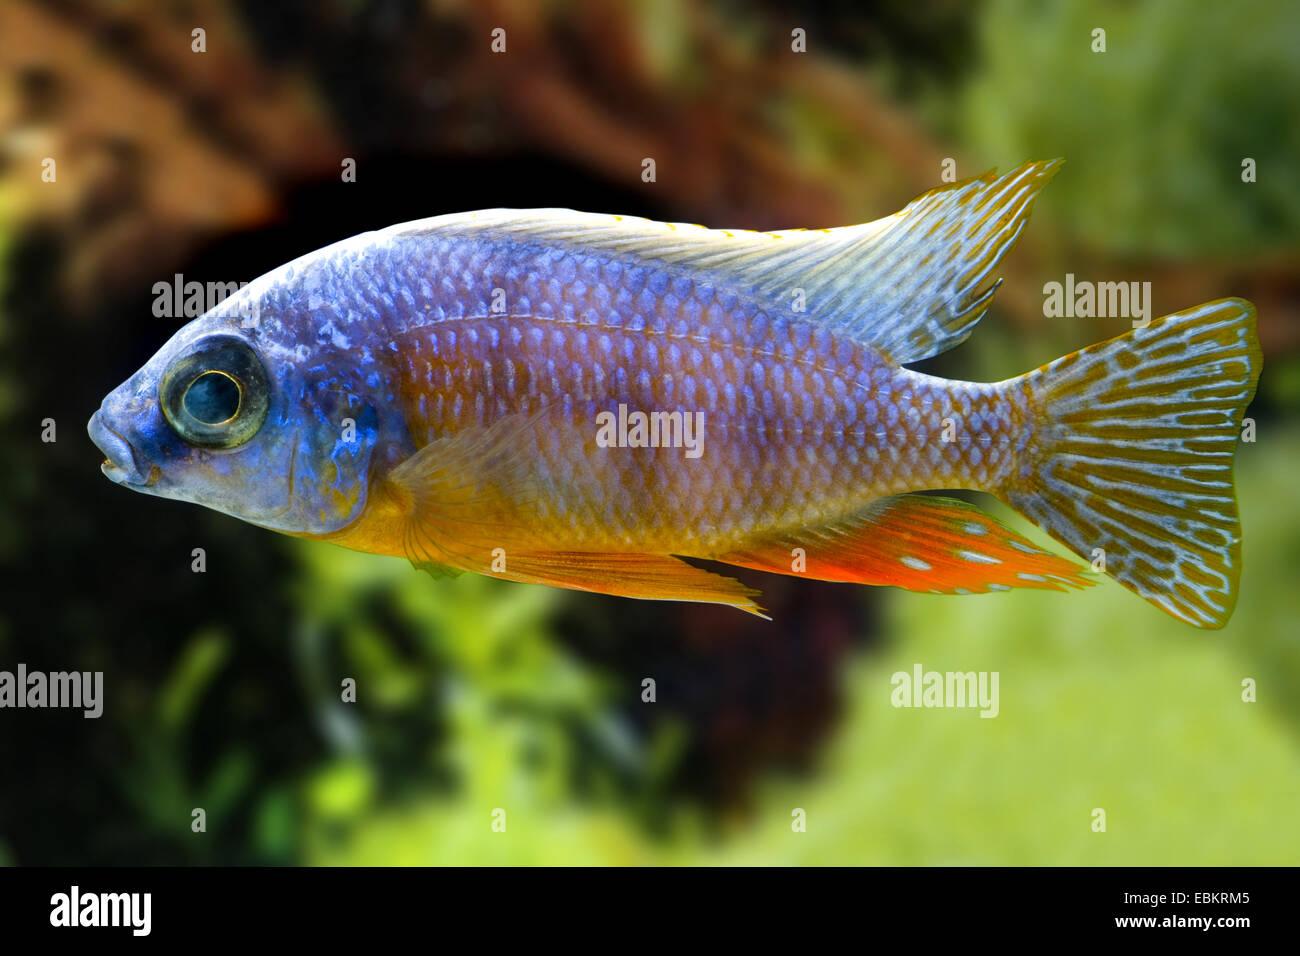 Malawi Cichlid (Protomelas steveni), swimming - Stock Image